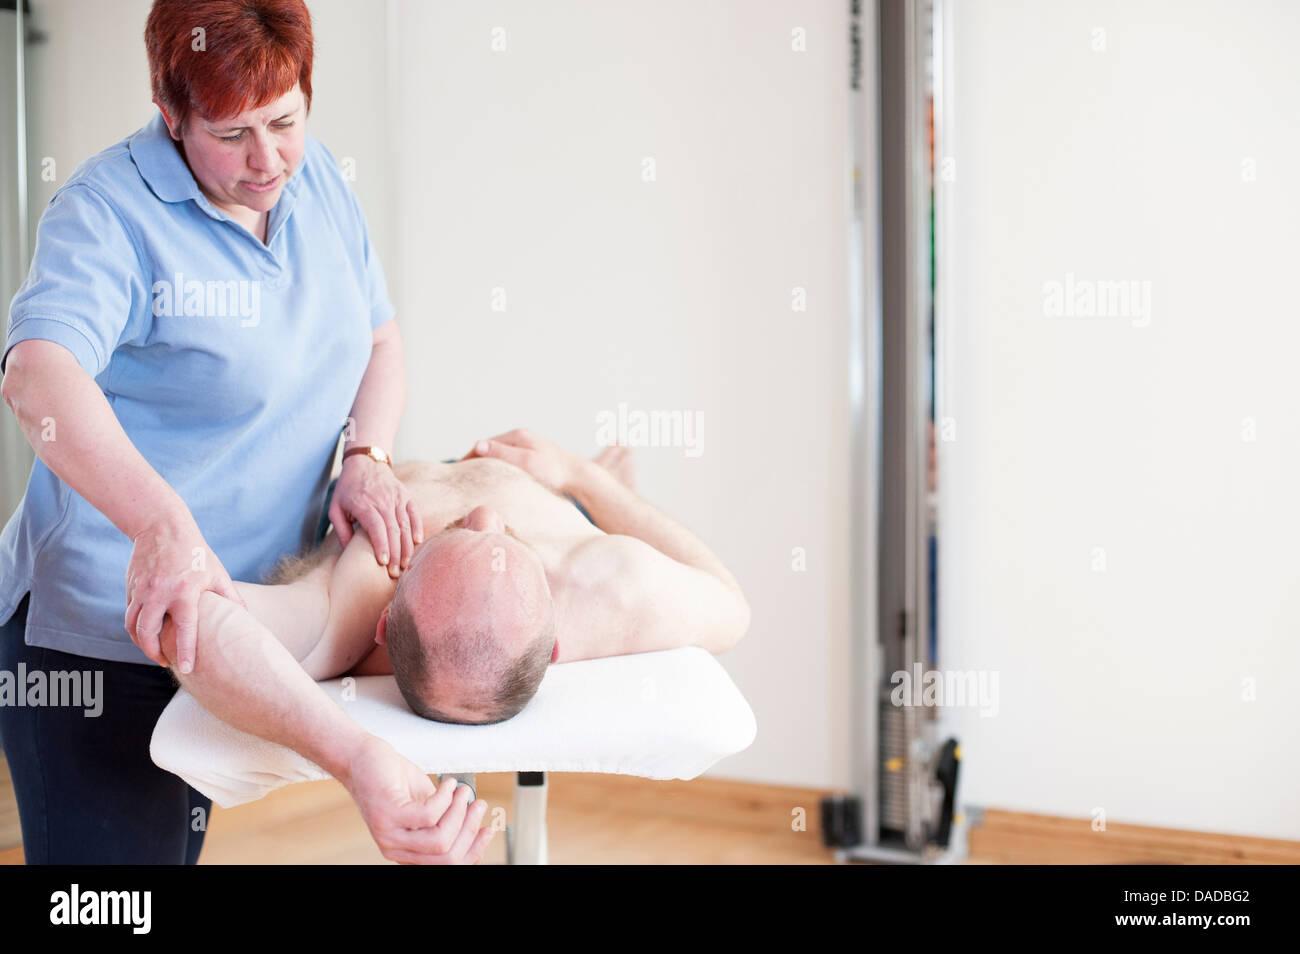 Woman giving man massage treatment Stock Photo